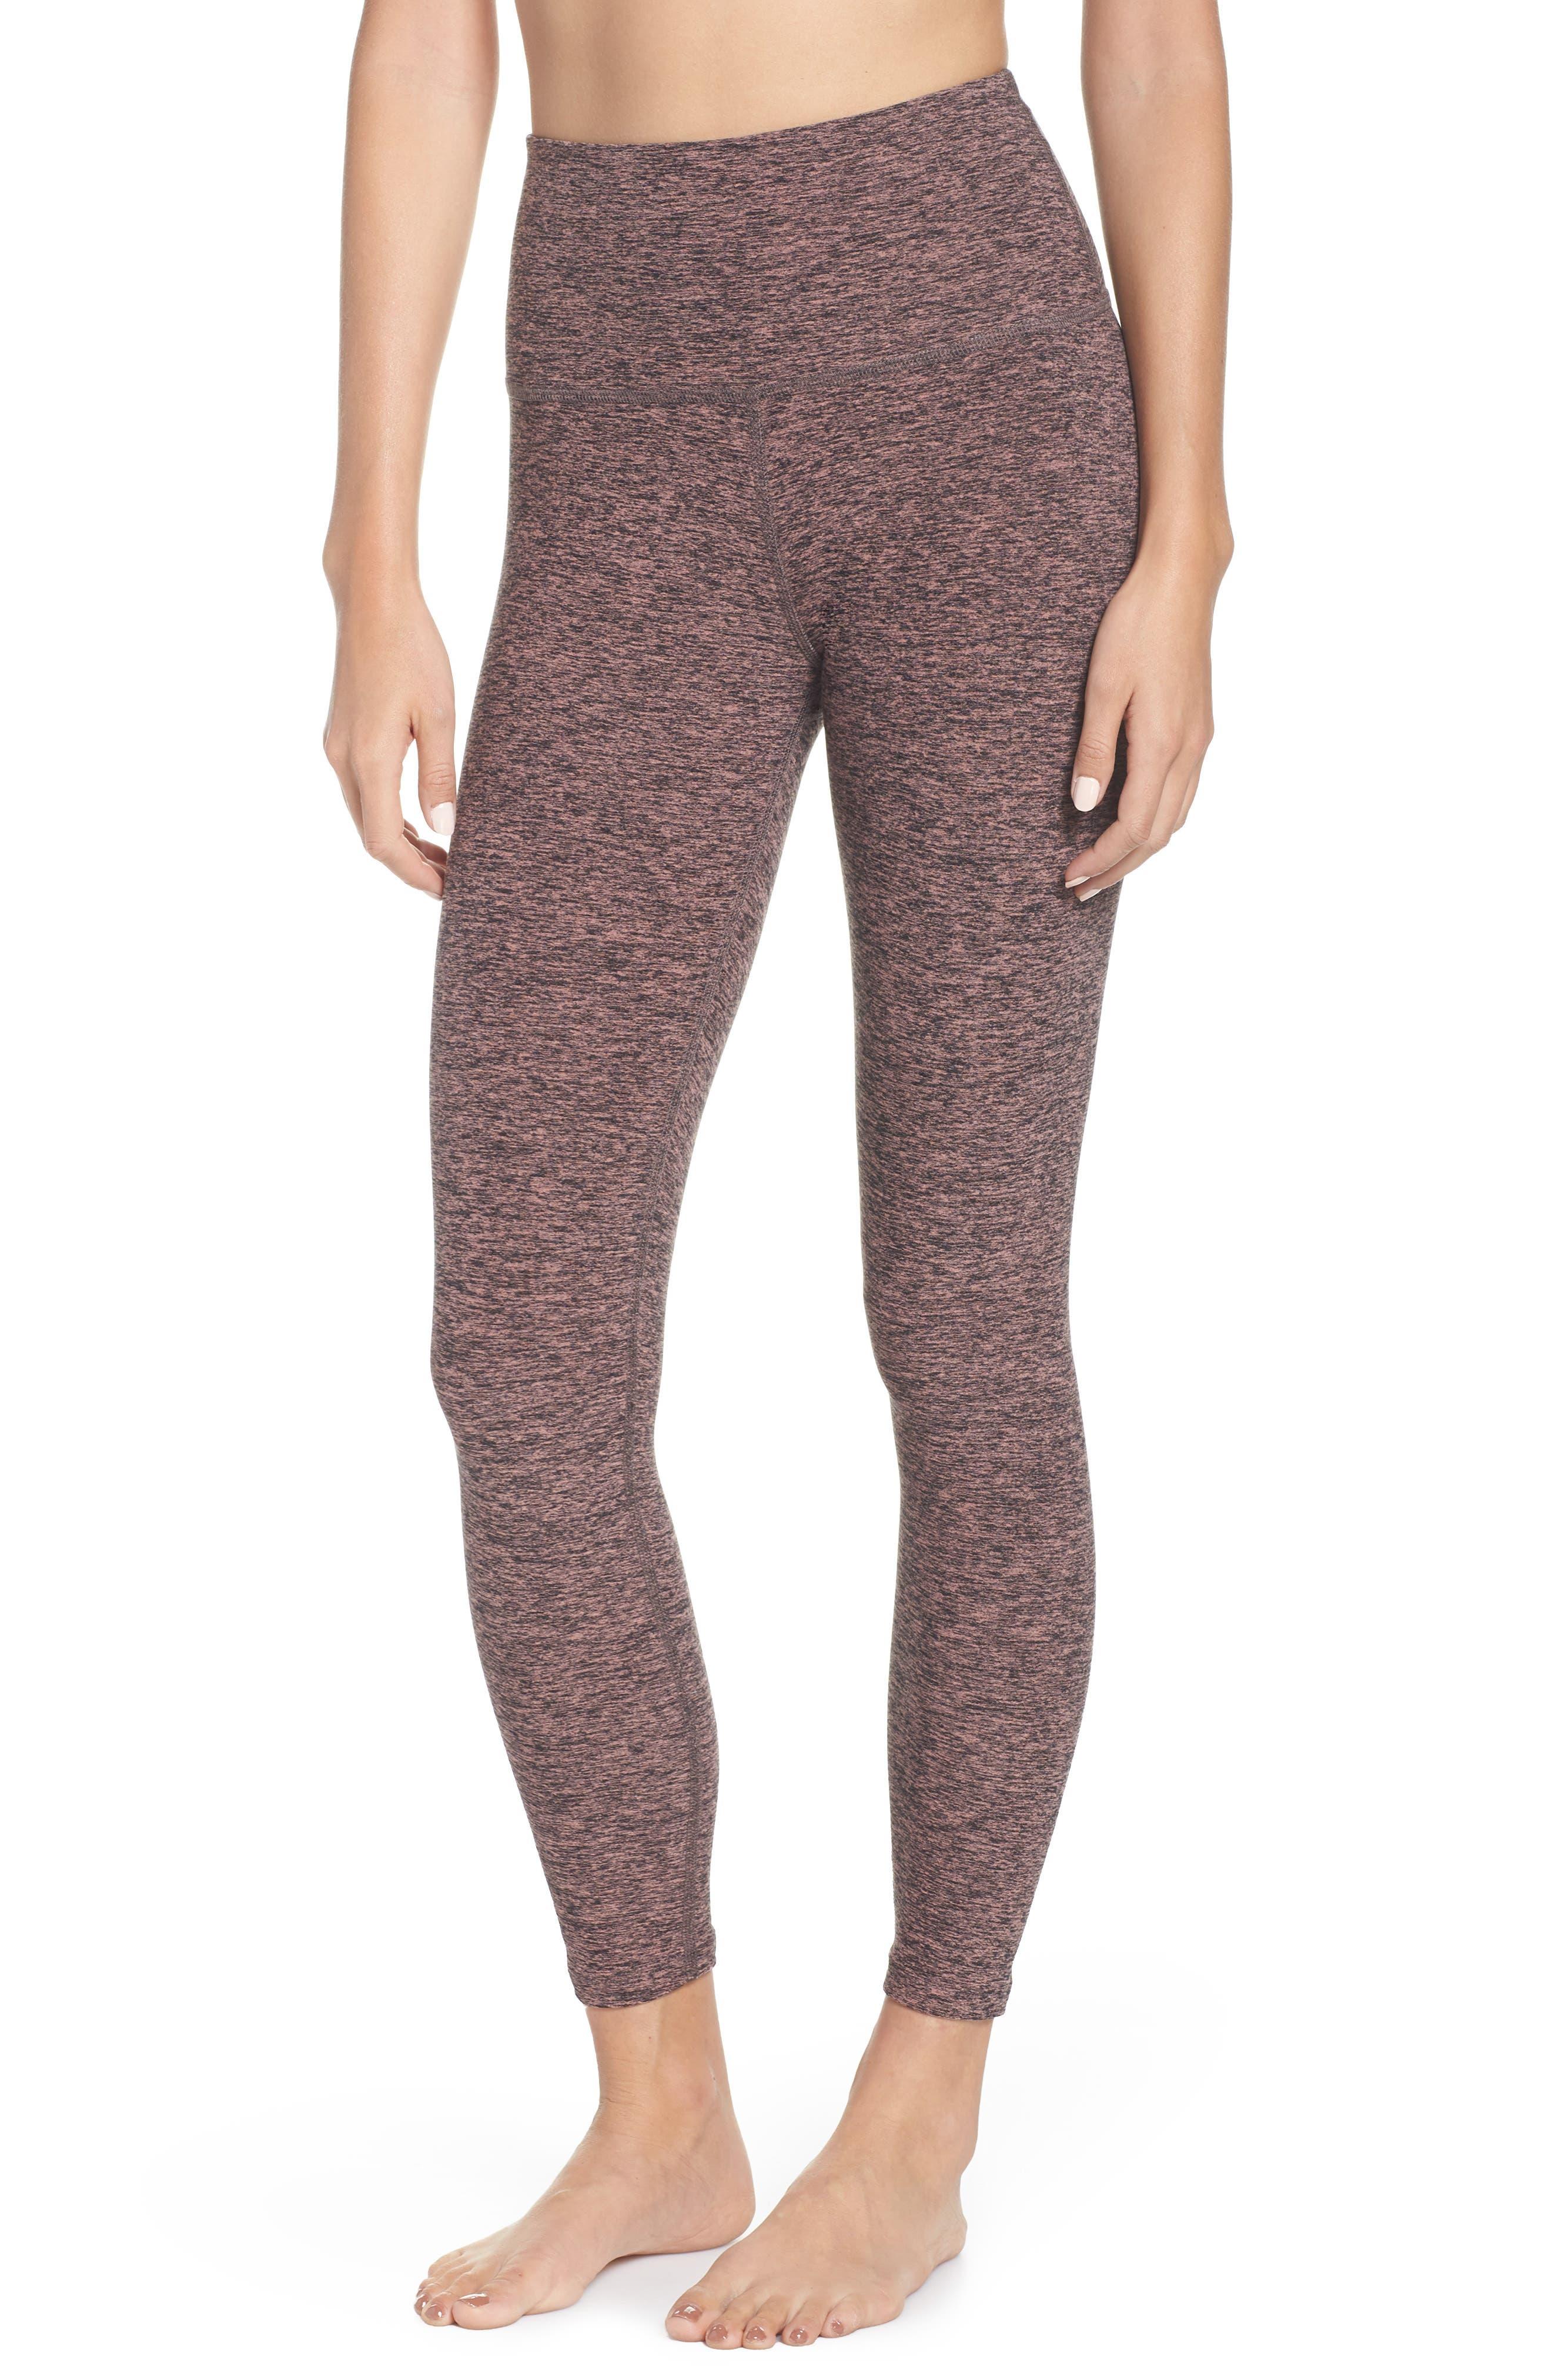 BEYOND YOGA Midi High Waist Leggings, Main, color, BLACK- PINK LEI